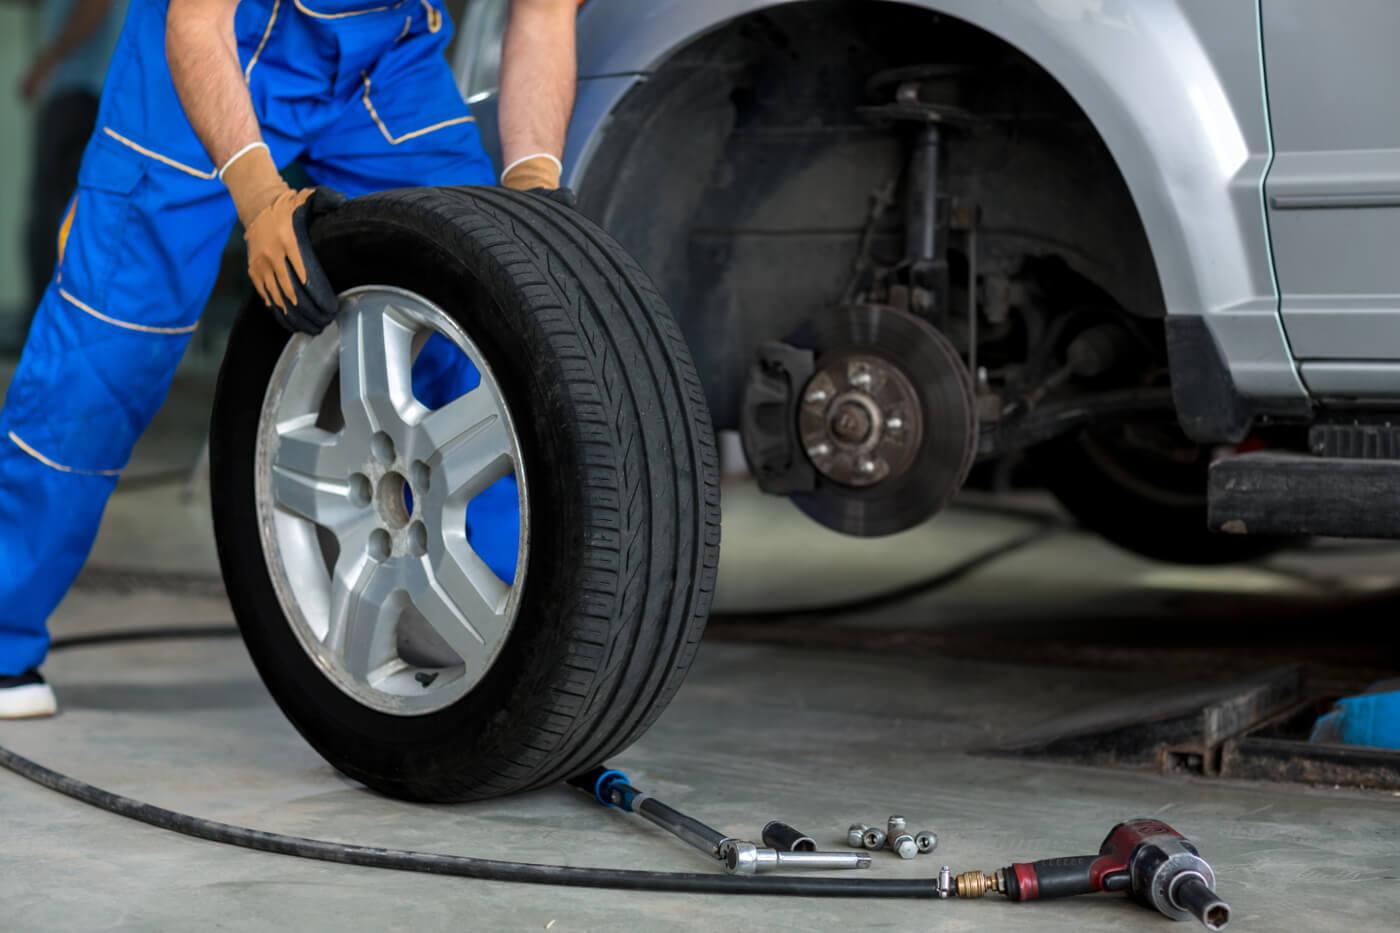 mechanic replacing a tire